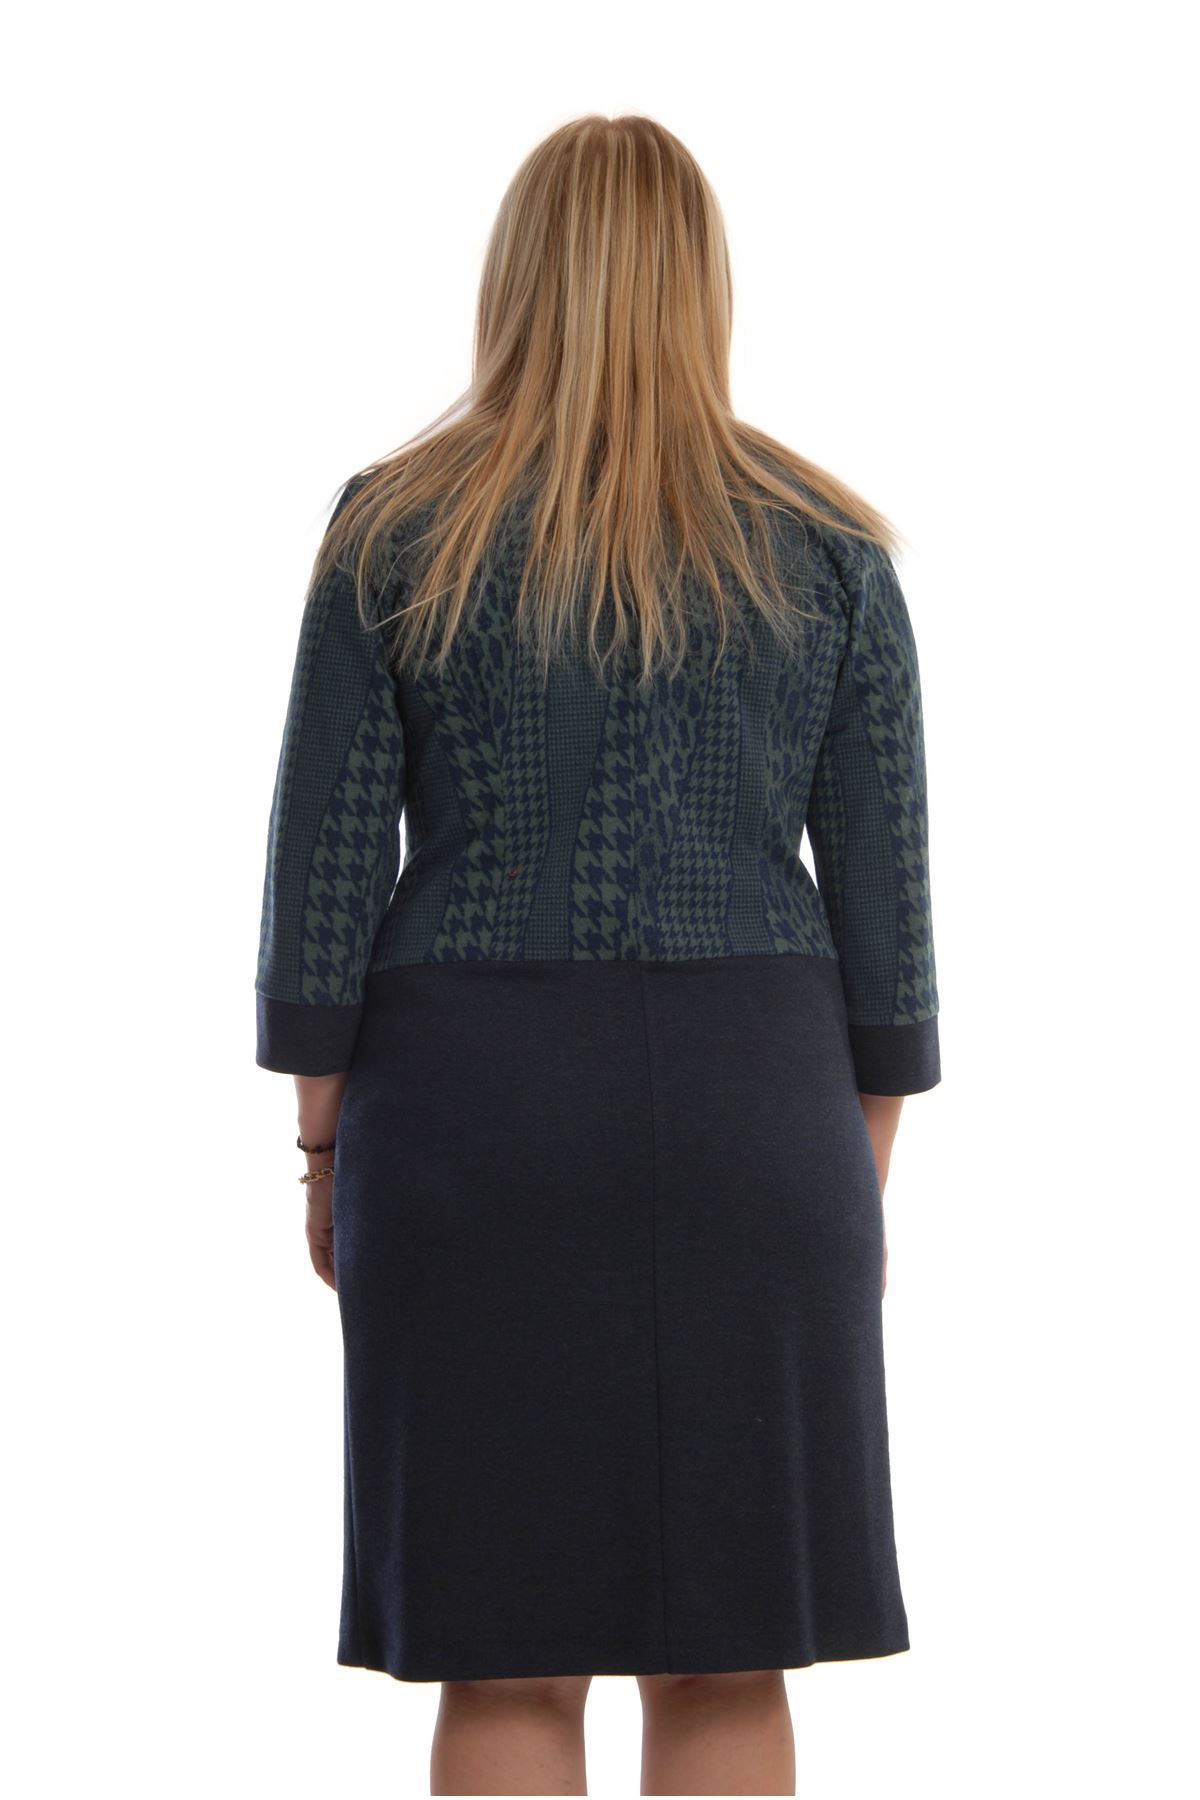 Lacivert Yeşil Elbise F11-68398